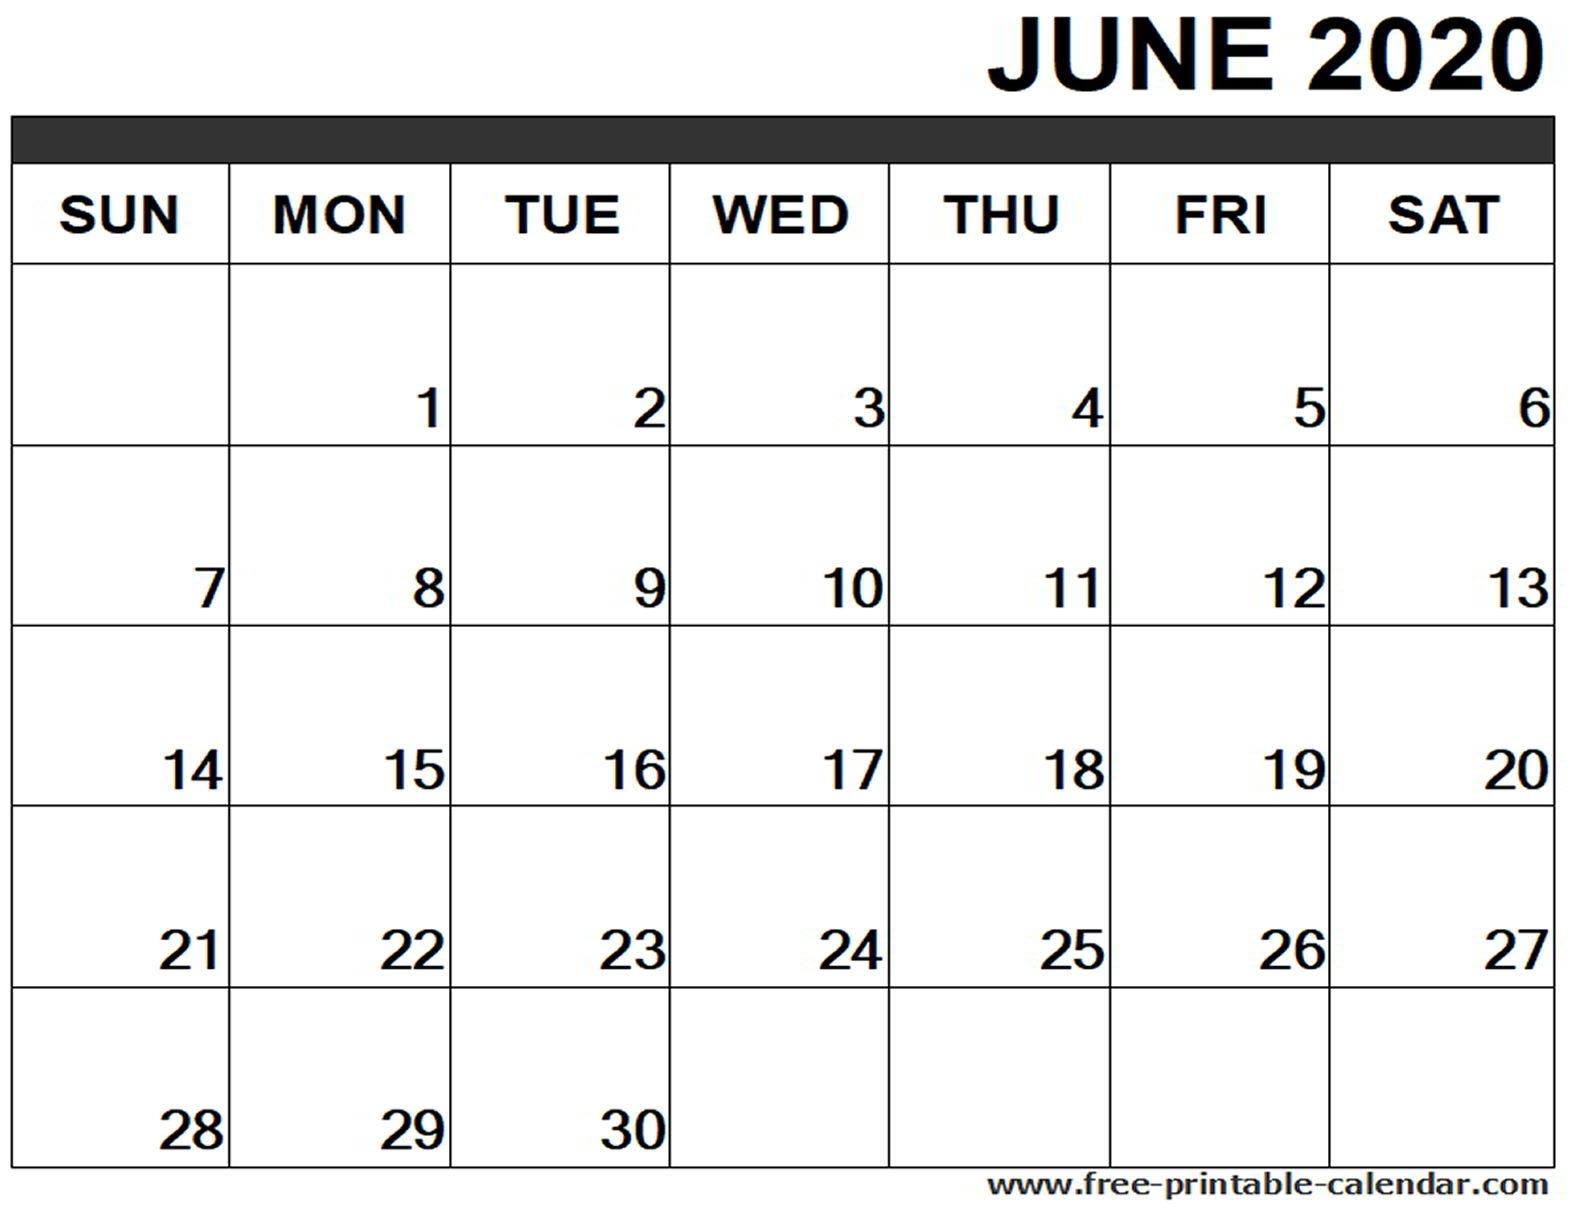 June 2020 Calendar Printable – Free-Printable-Calendar-2020